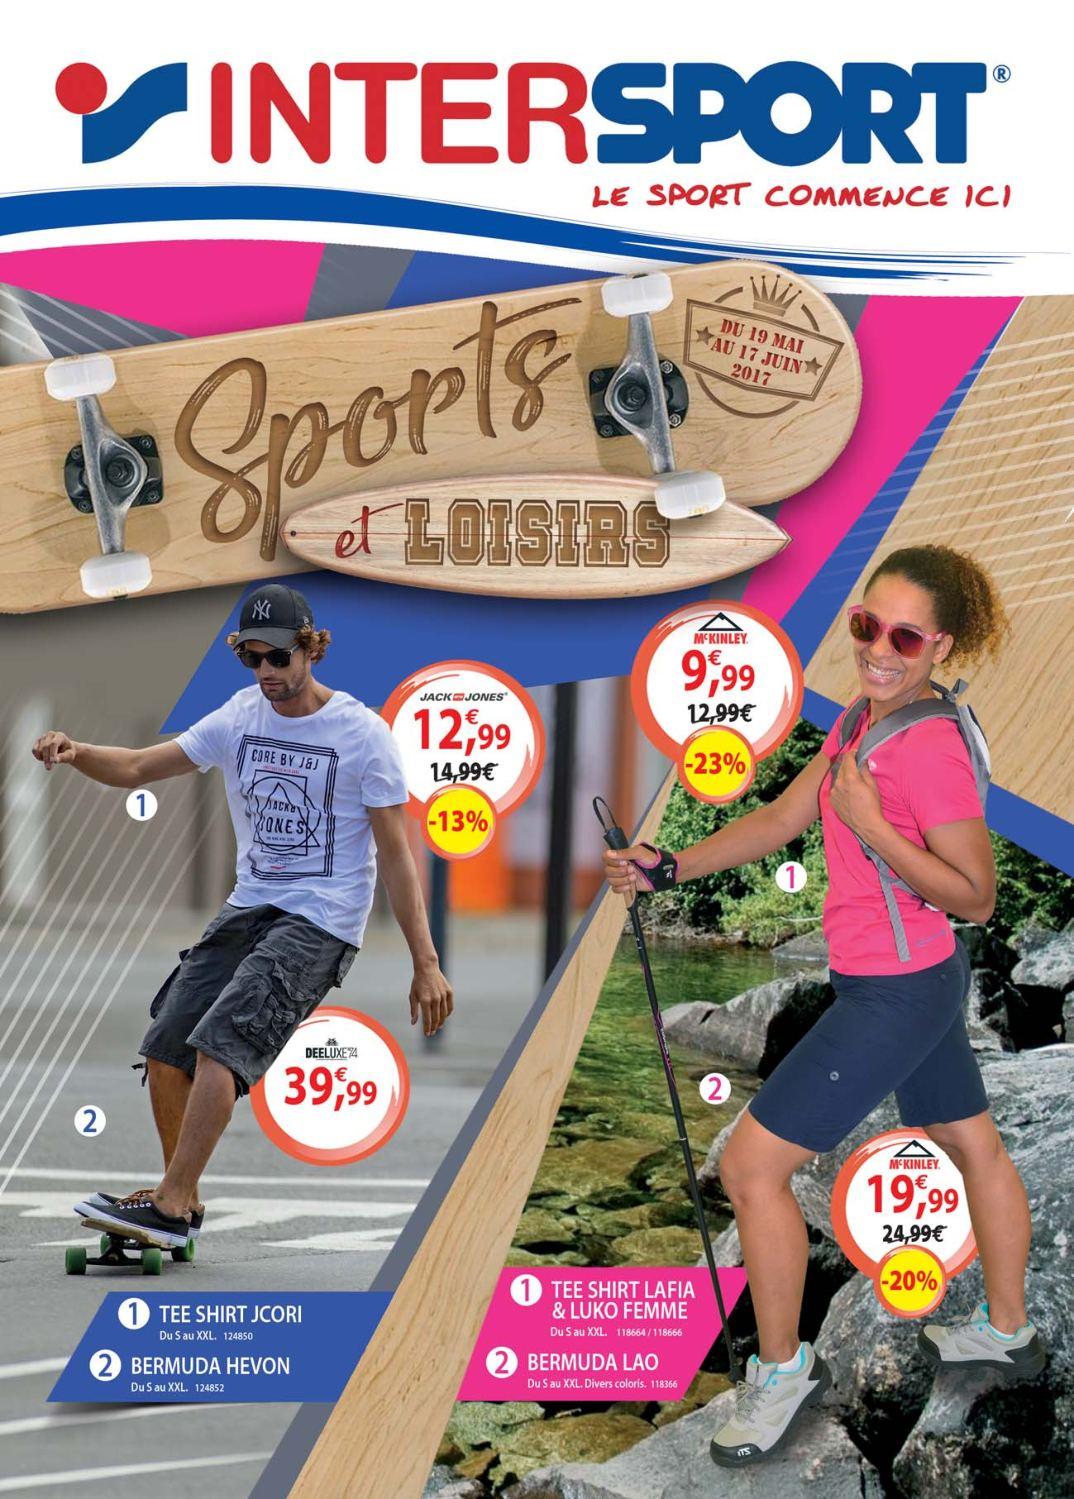 60e1b78f58b5e Sports Et Loisirs Intersport Martinique Guadeloupe 2017 - CALAMEO ...